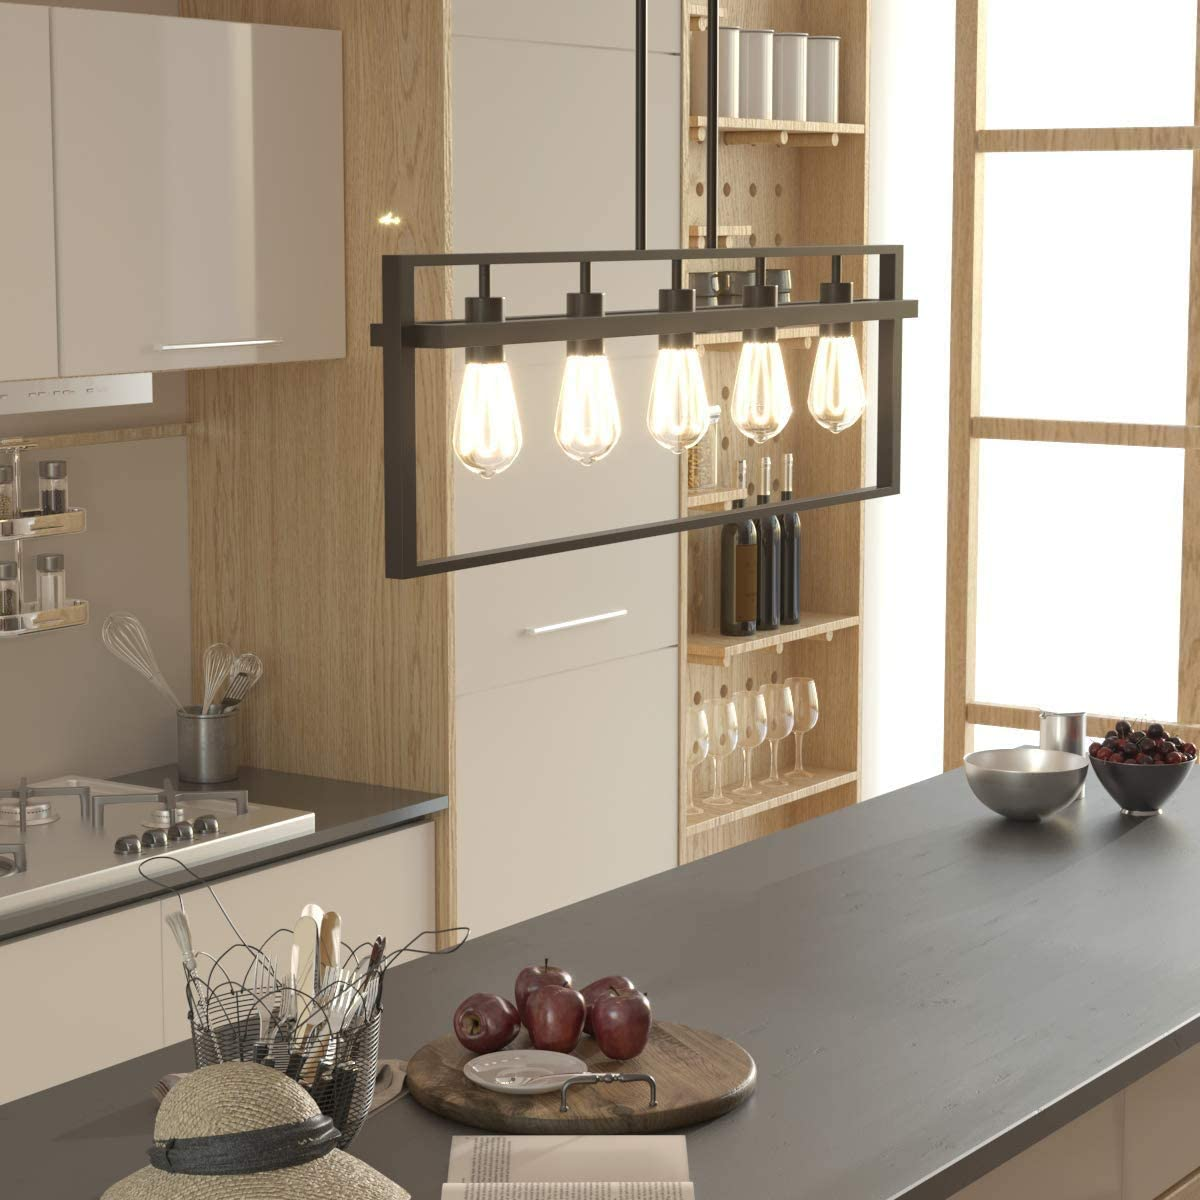 Tangkula 5-Light Island Lighting, Modern Style Domestic Linear Pendant Light Fixture, for Kitchen Dining Room Hallway, Pendant Lamps, Dark Brown Finish